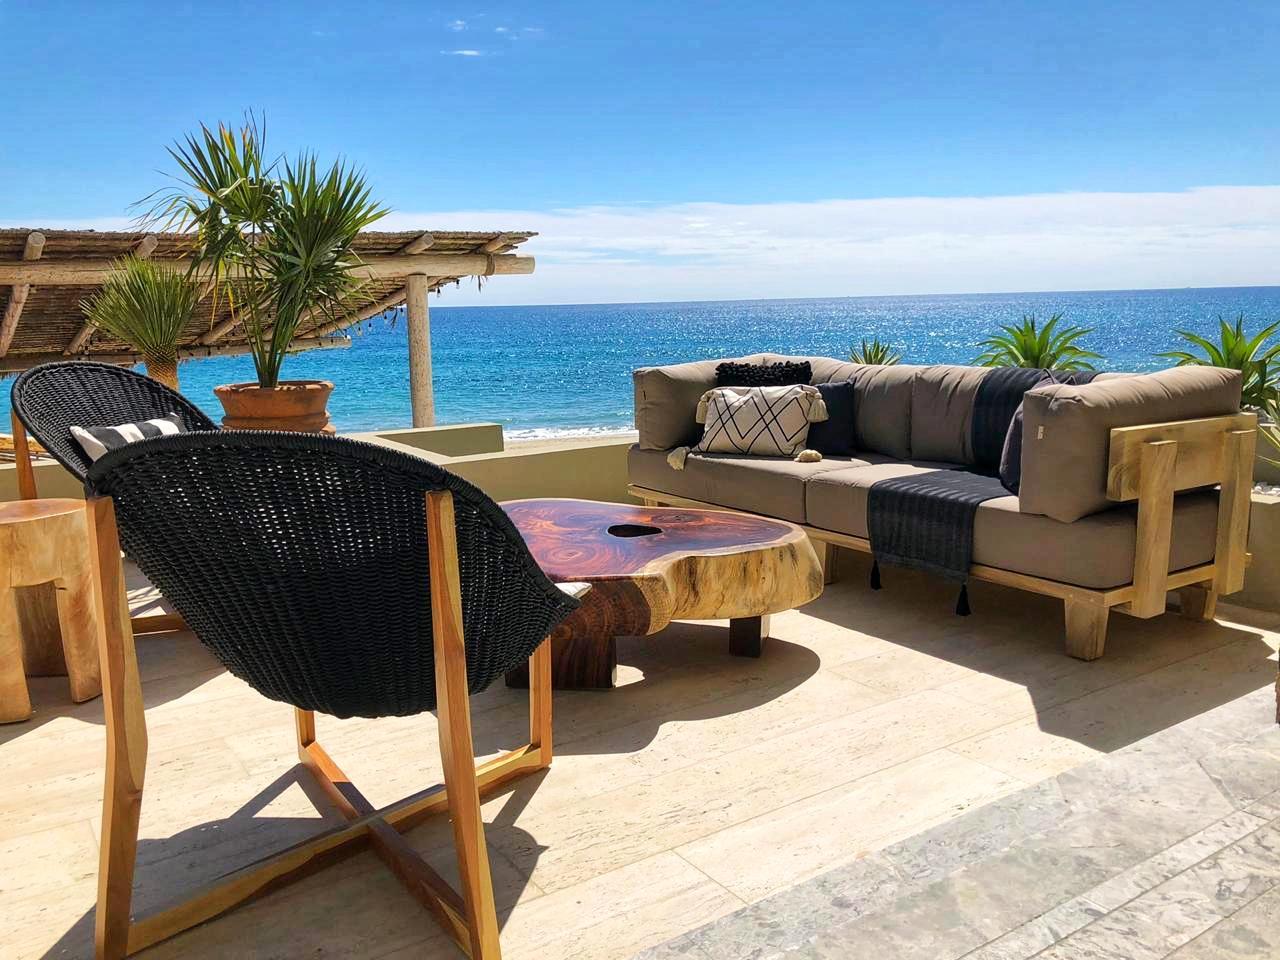 Soleado Resort